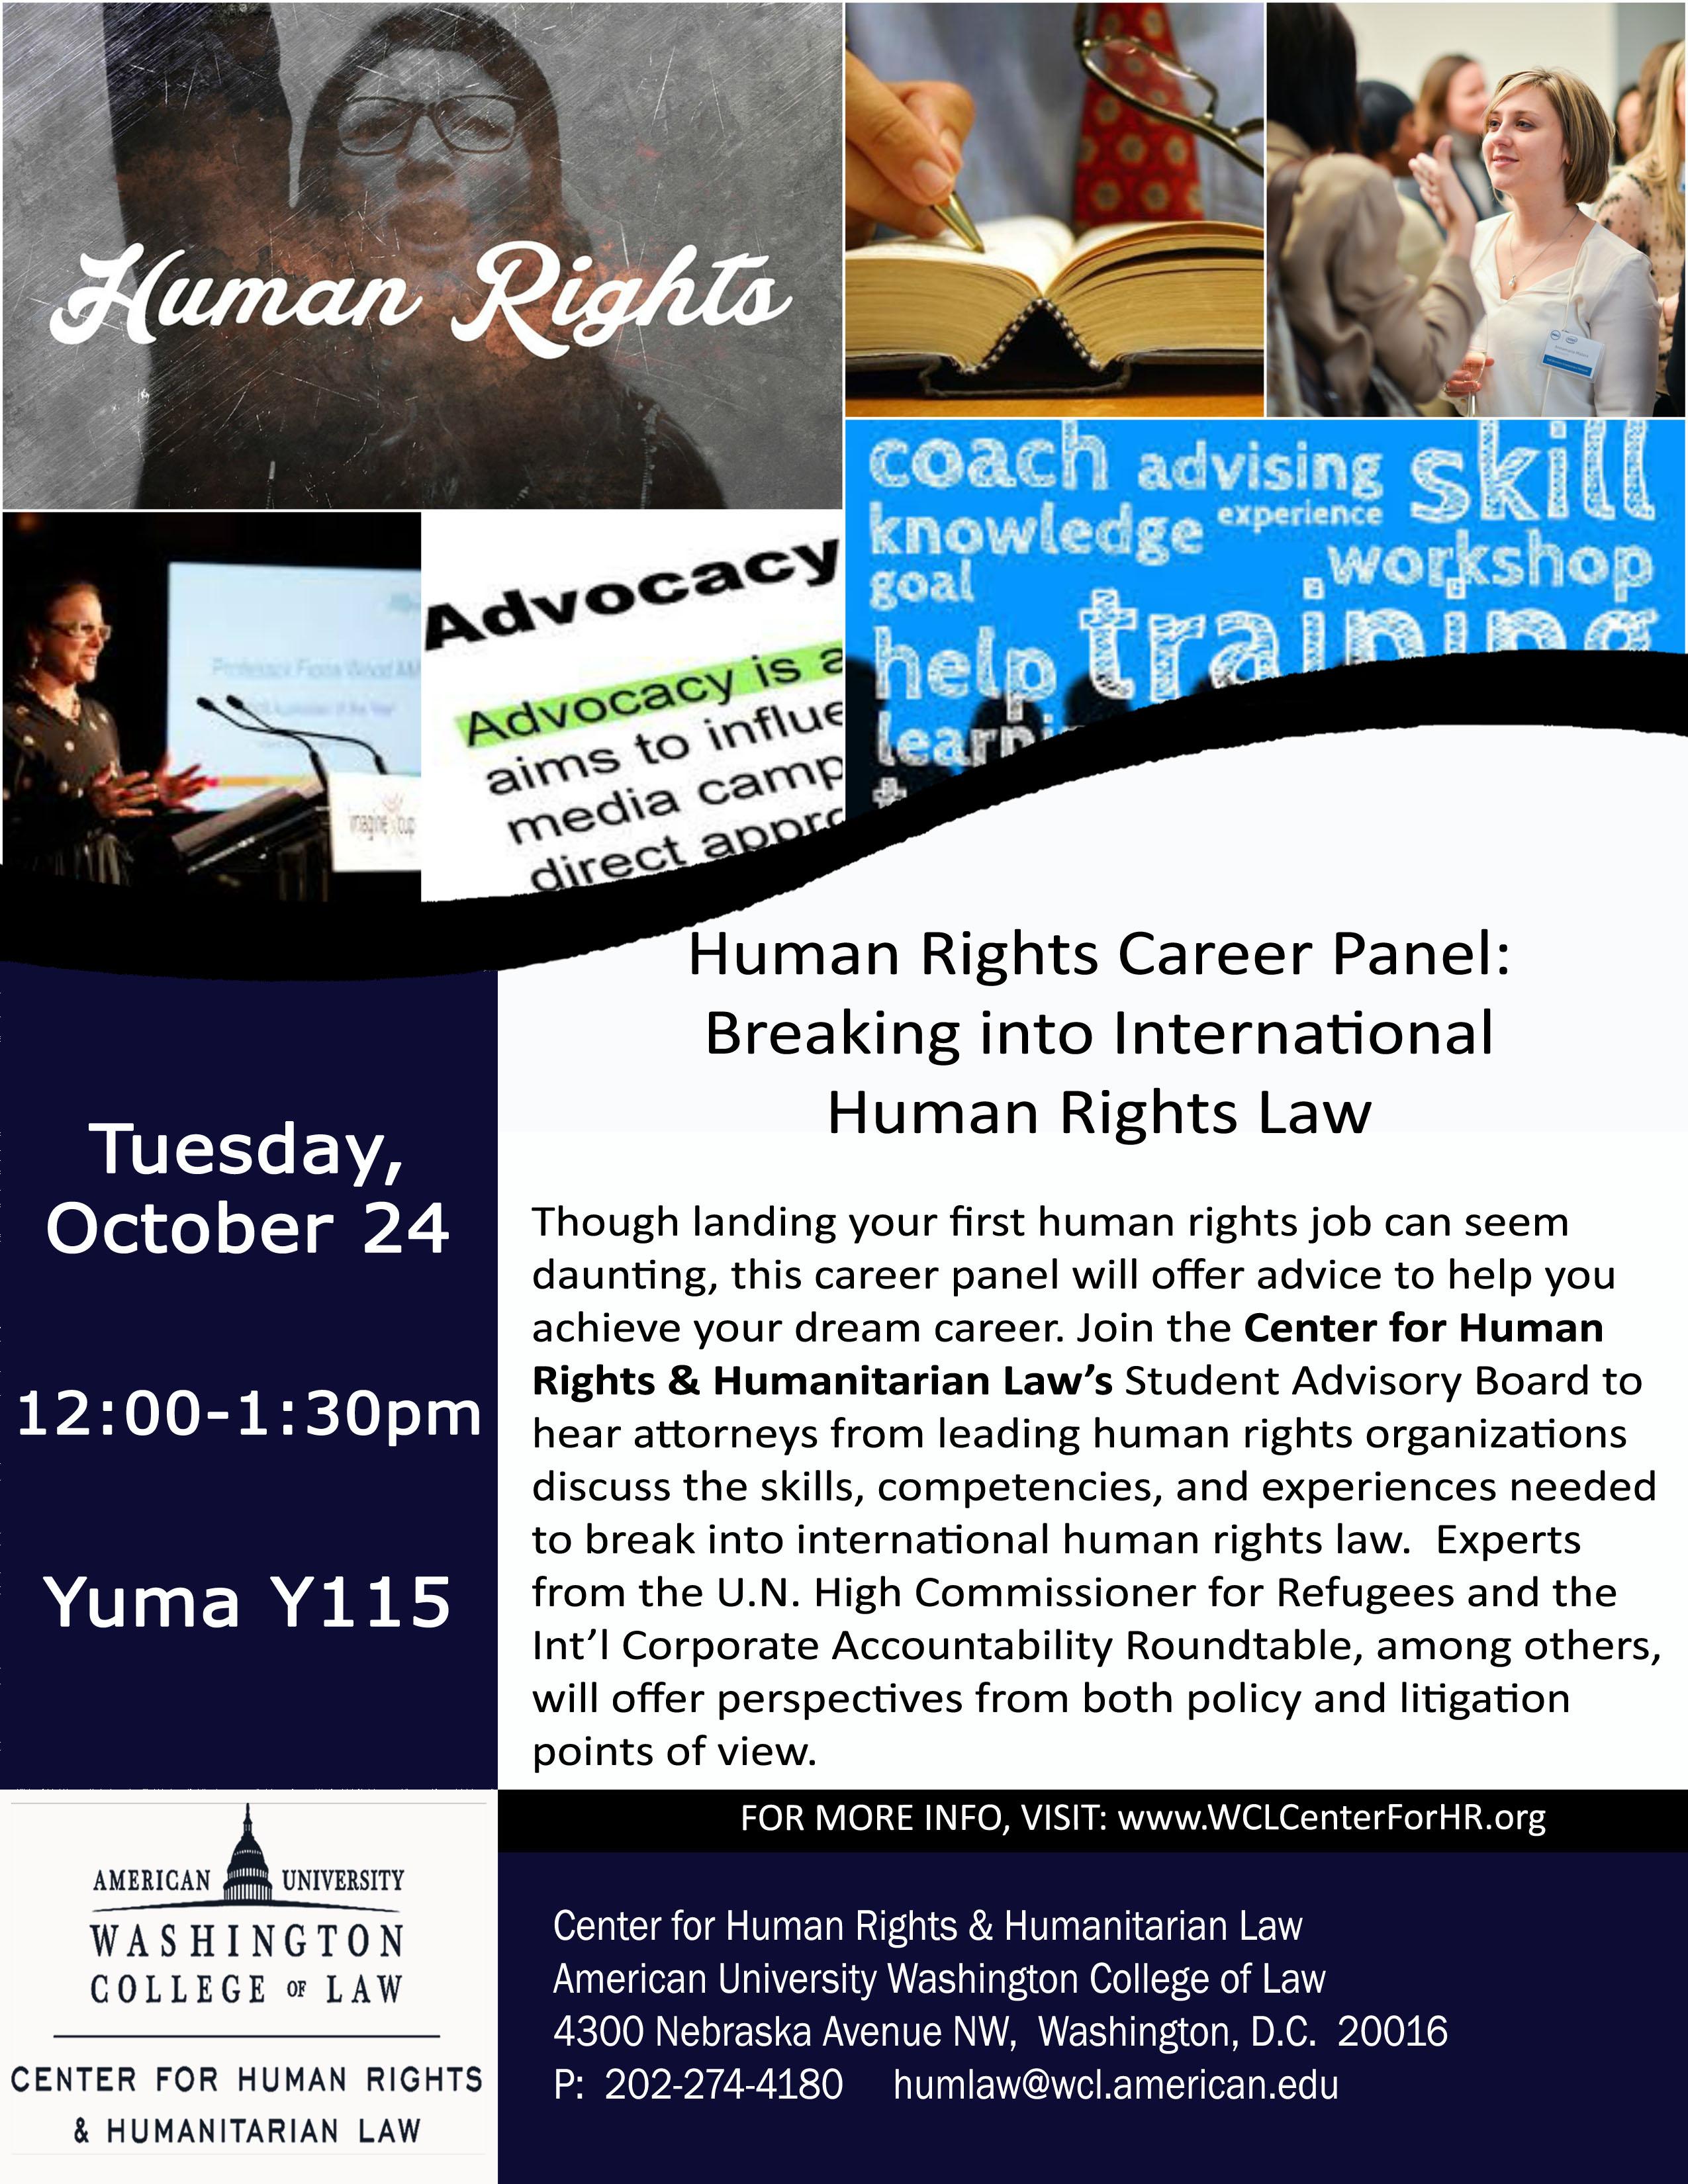 Human Rights Career Panel: Breaking into International Human